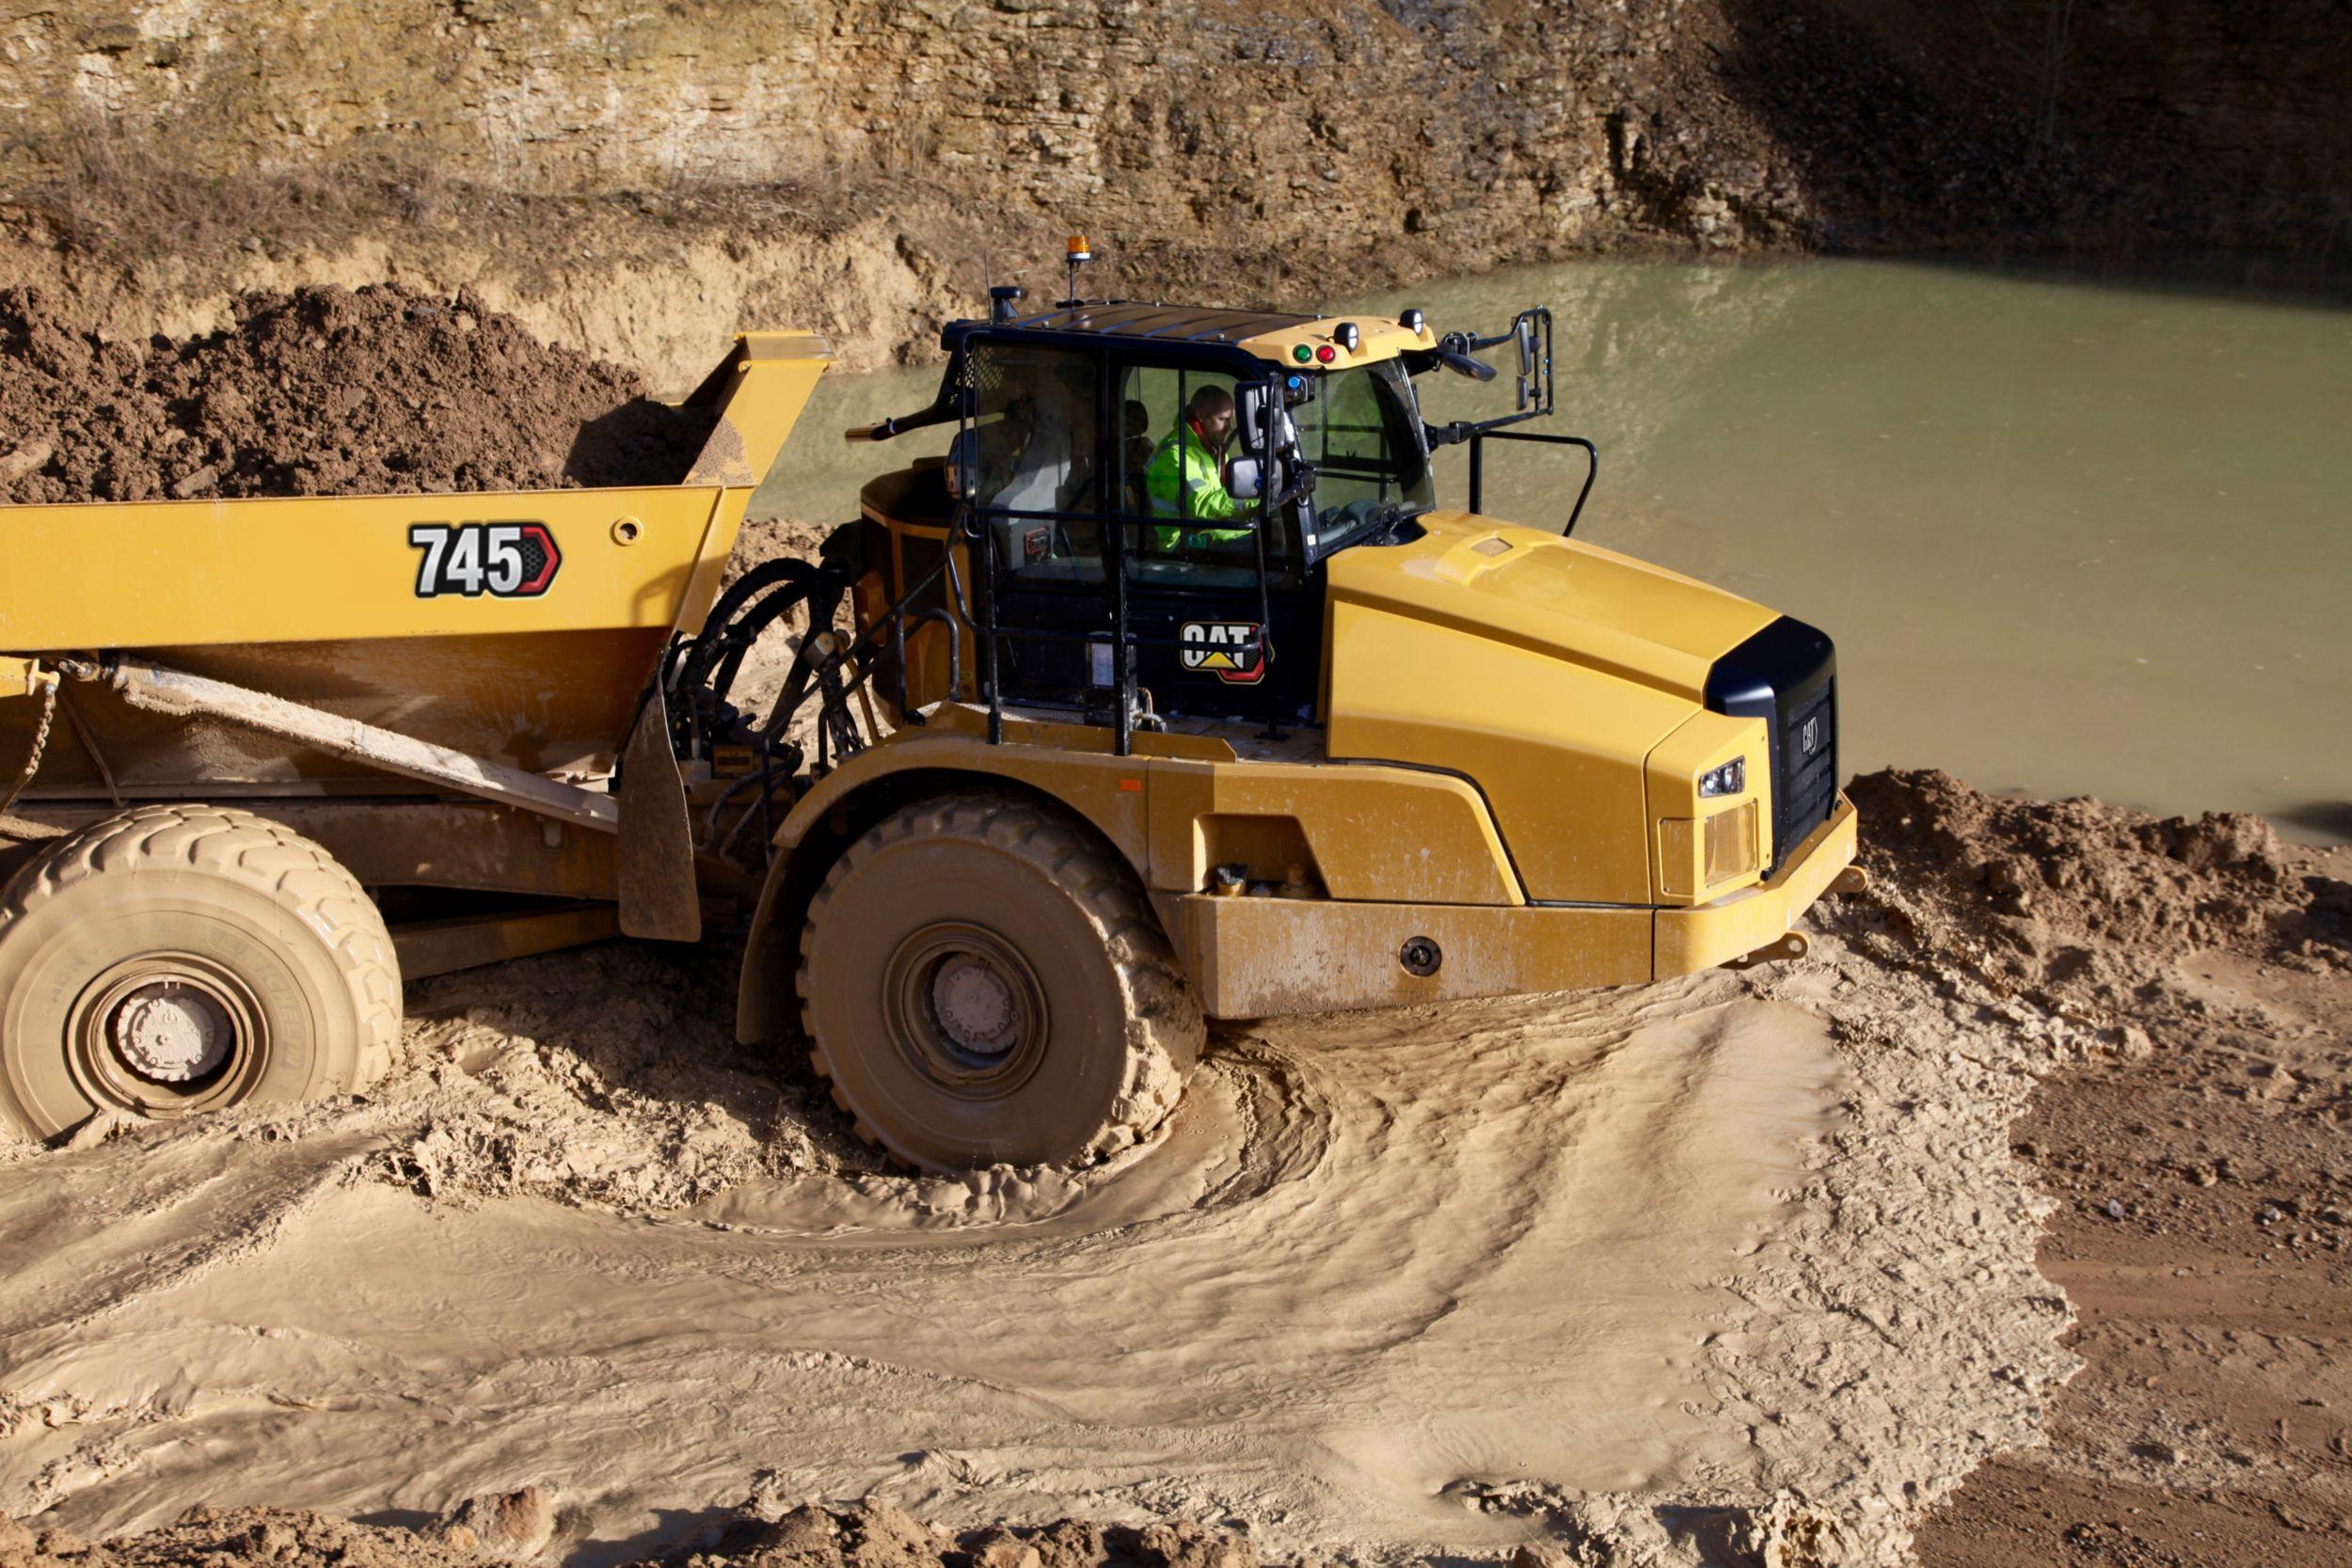 745 Articulated Truck